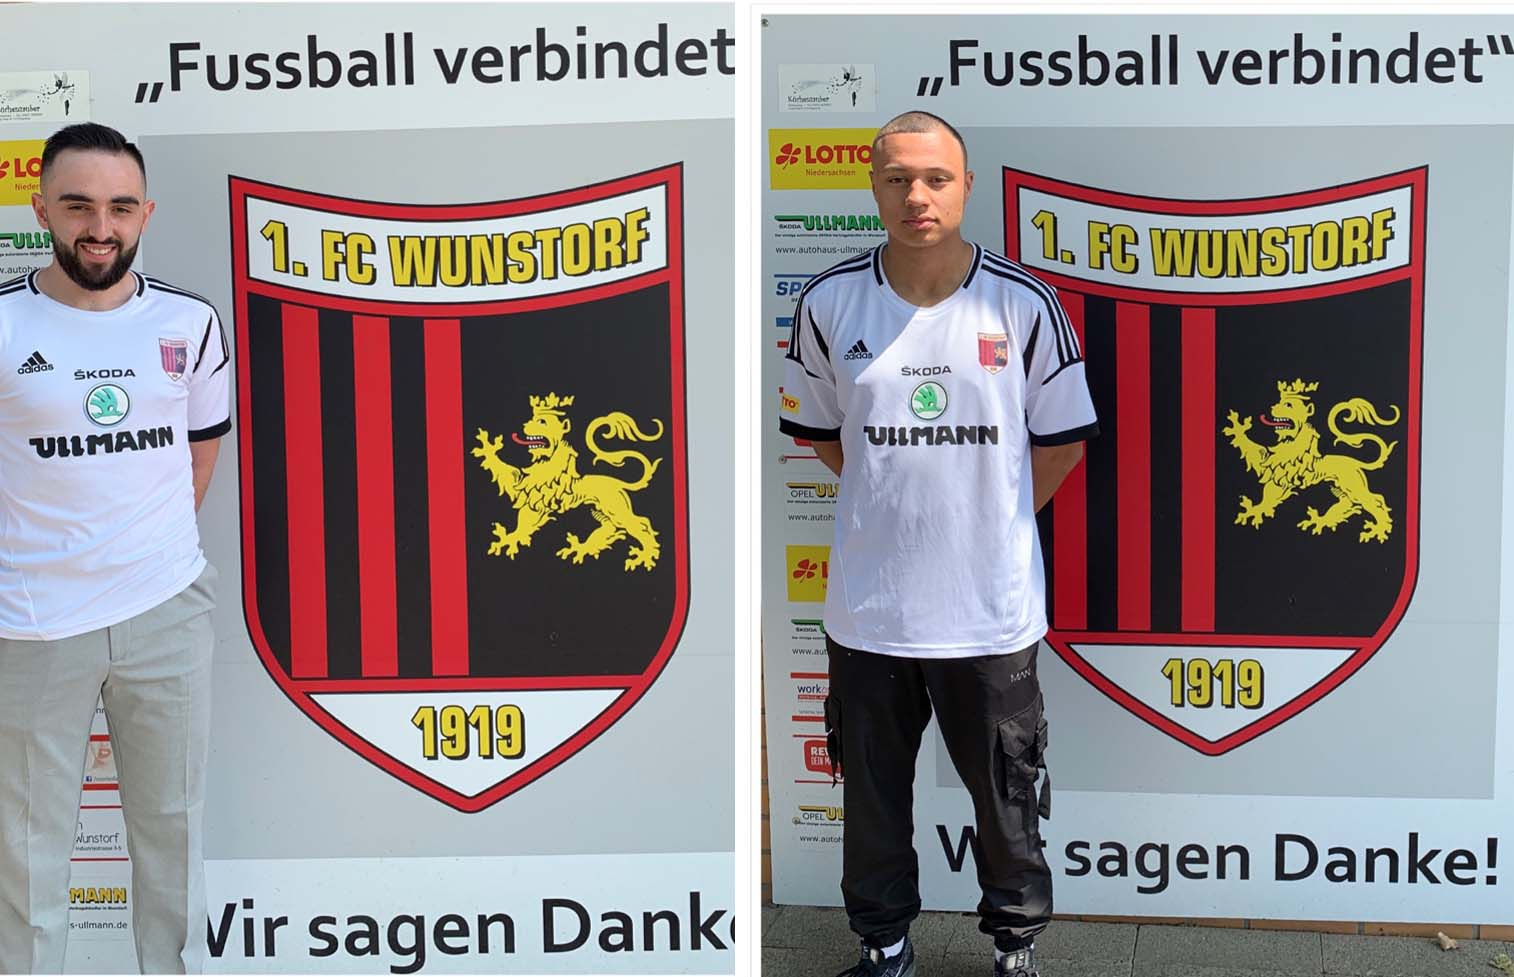 1 Fc Wunstorf